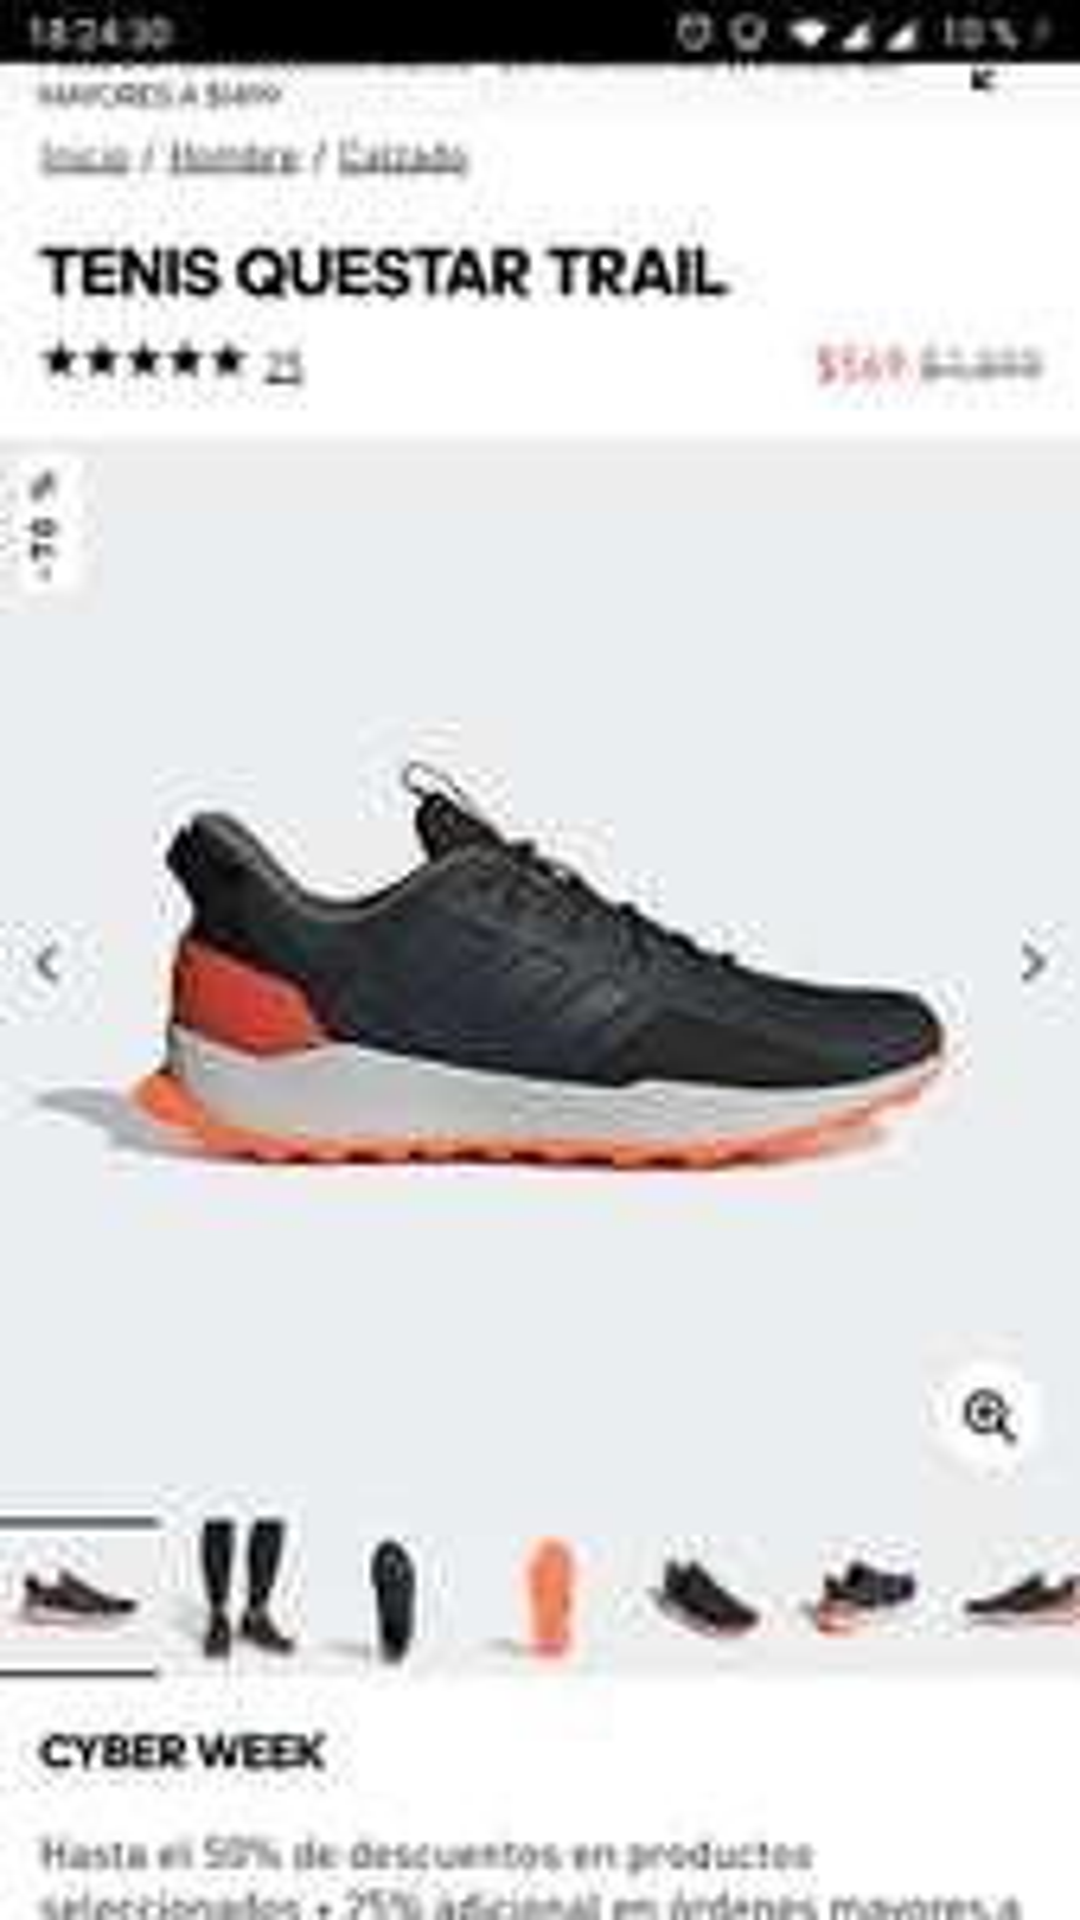 Adidas: Tenis questar trail